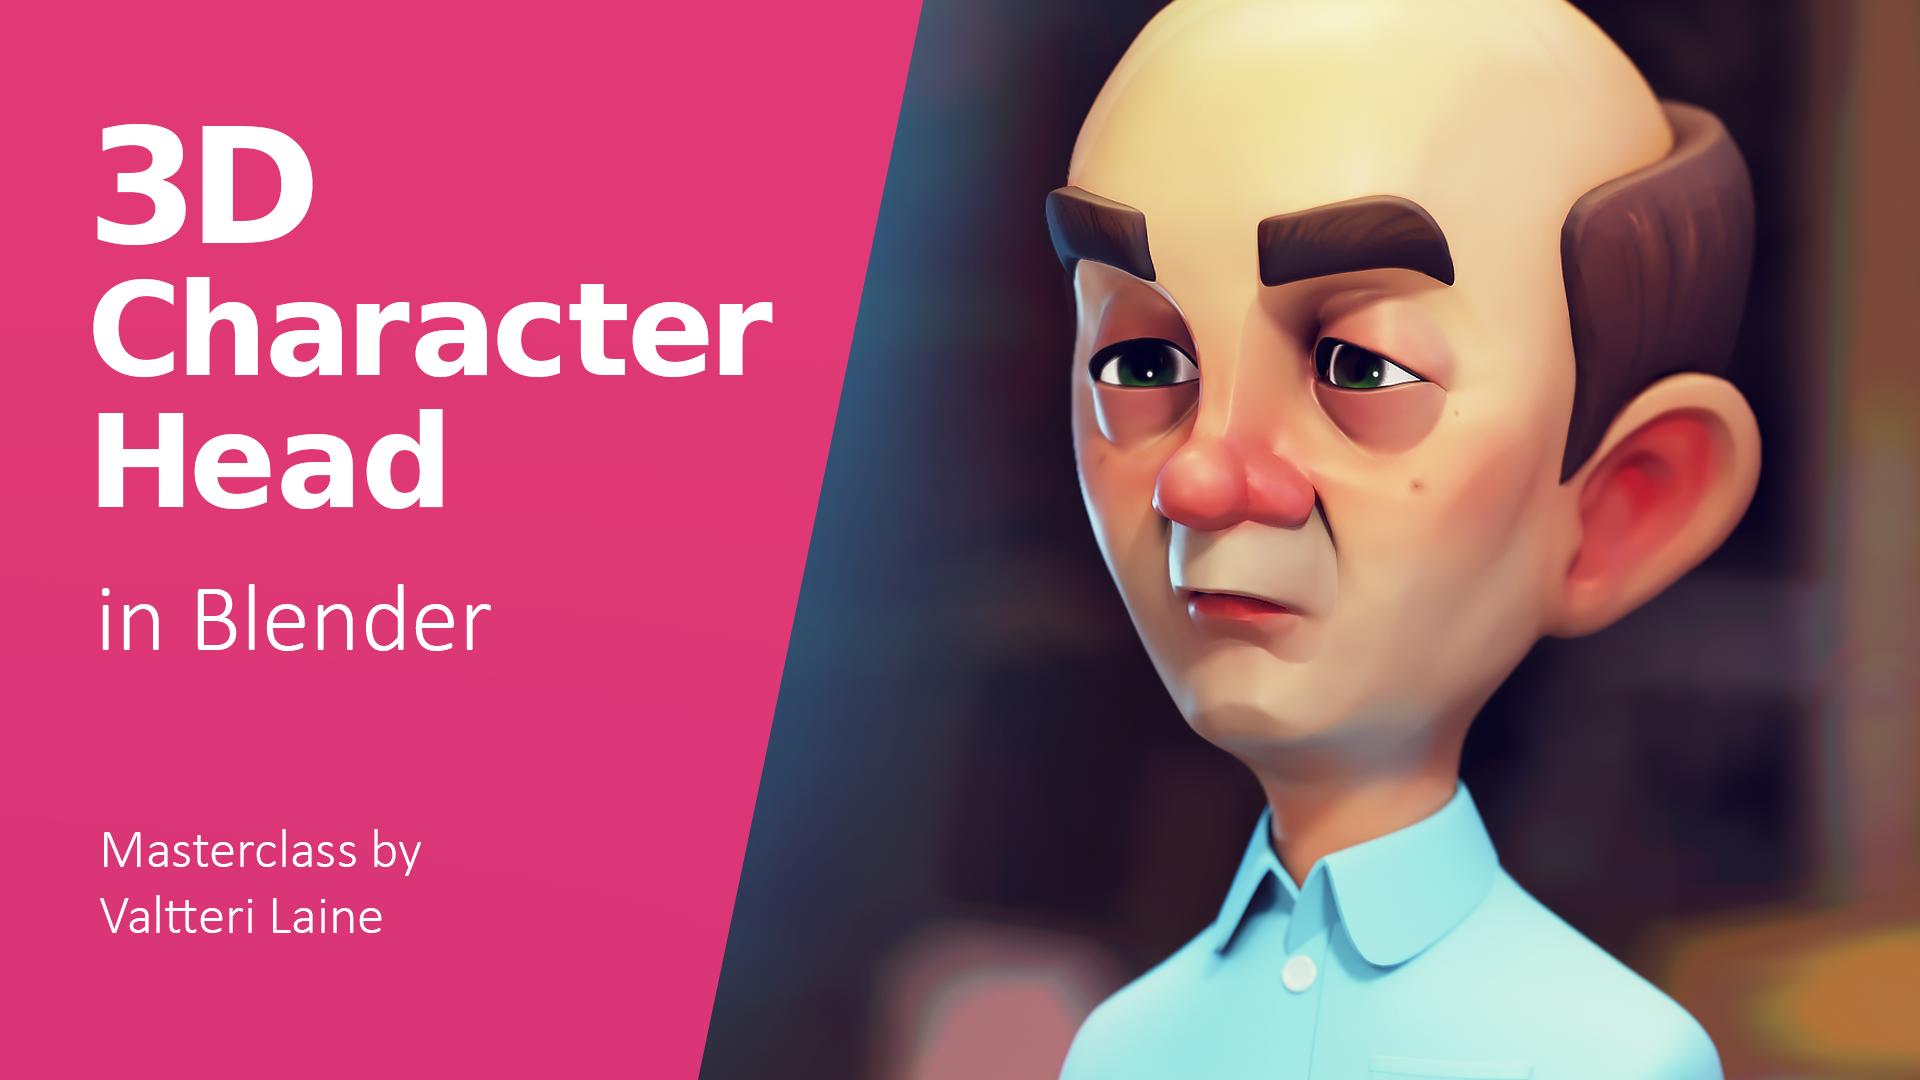 3D Character Head in Blender